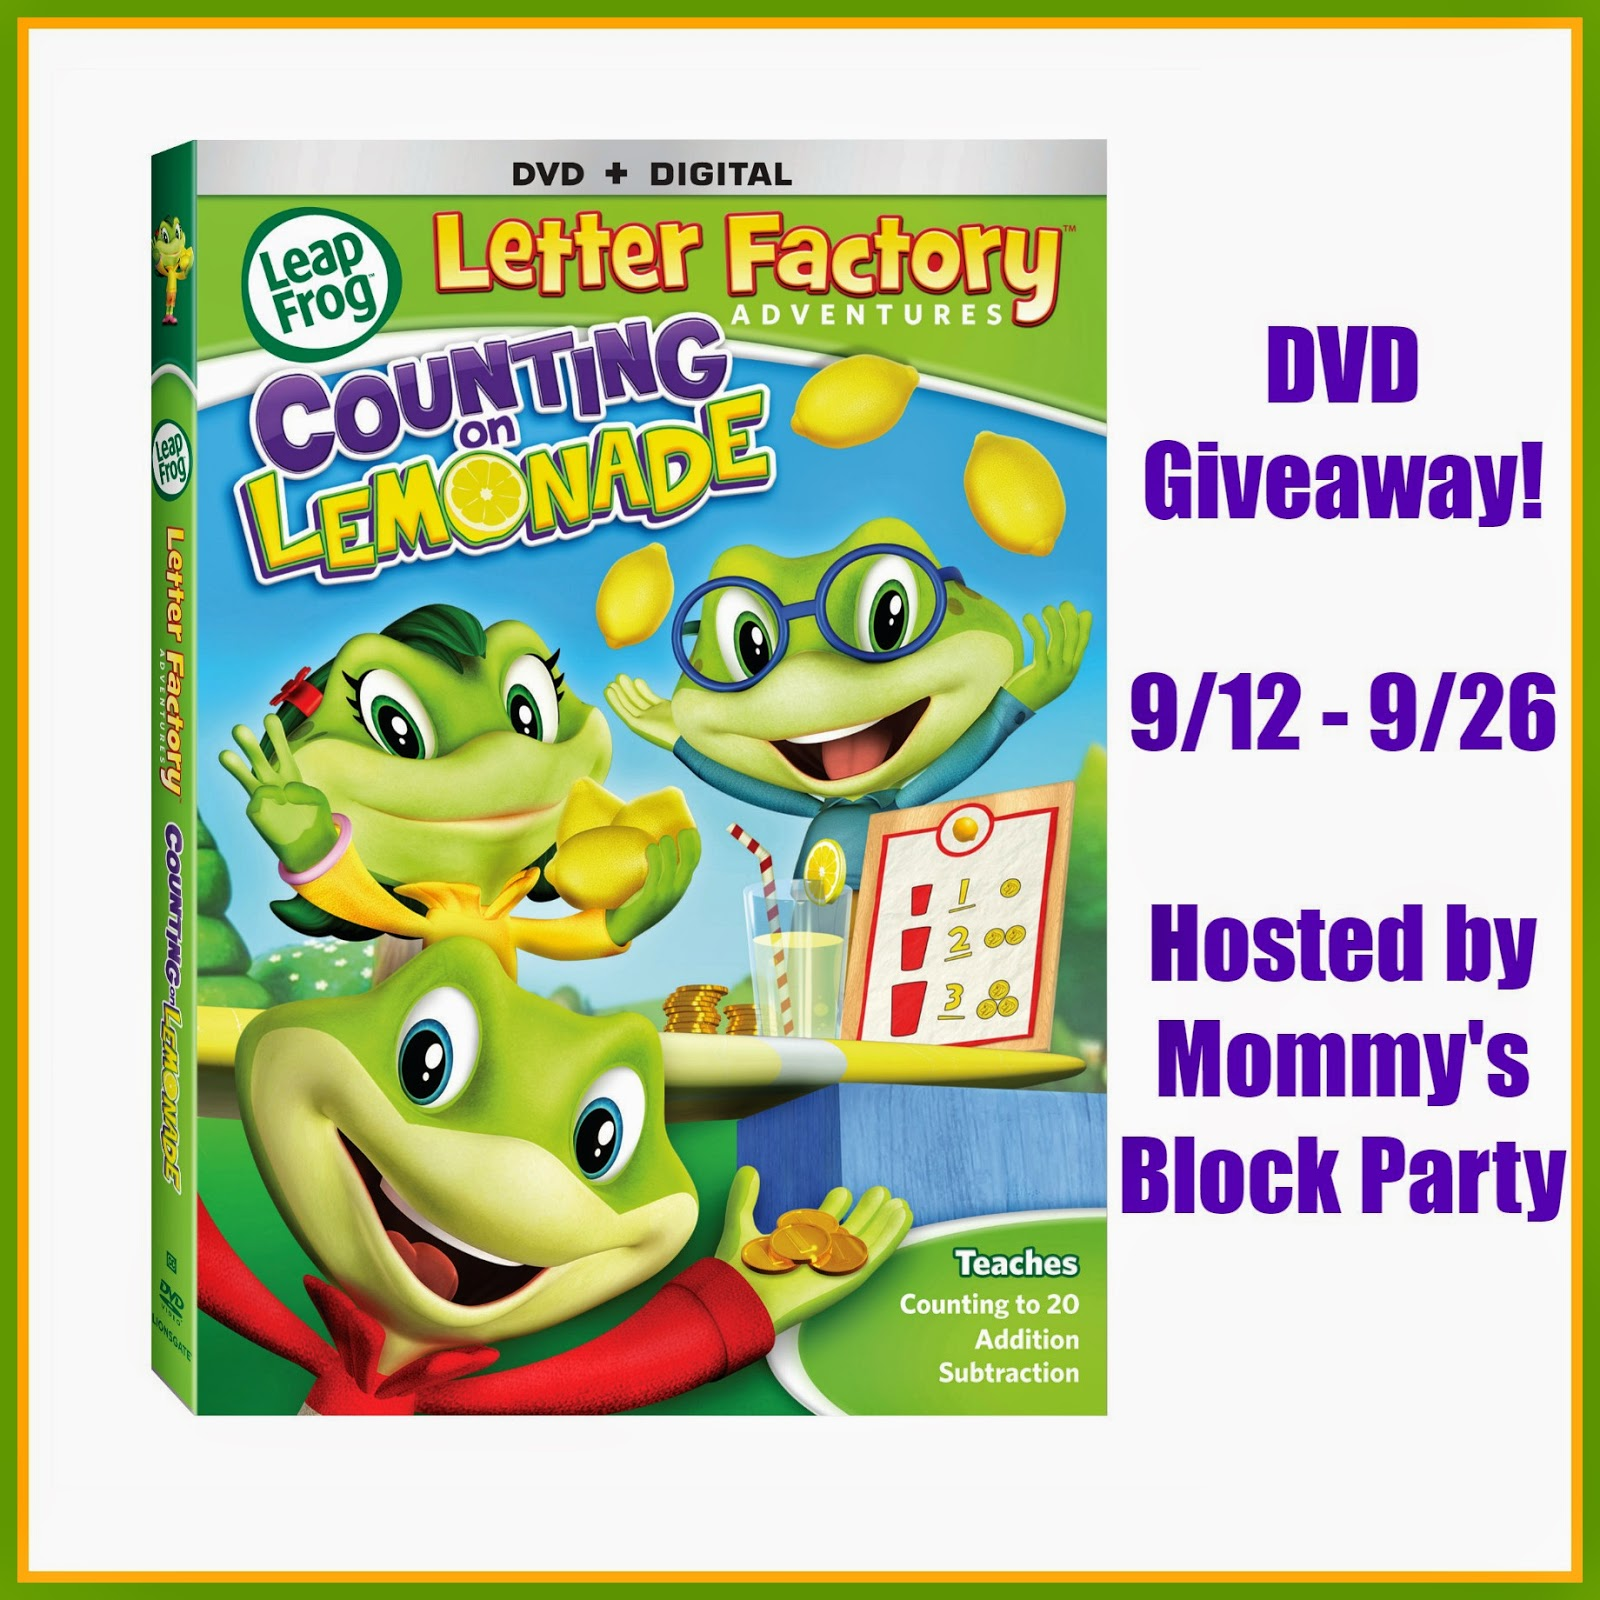 LeapFrog Letter Factory Adventures Counting on Lemonade DVD Review